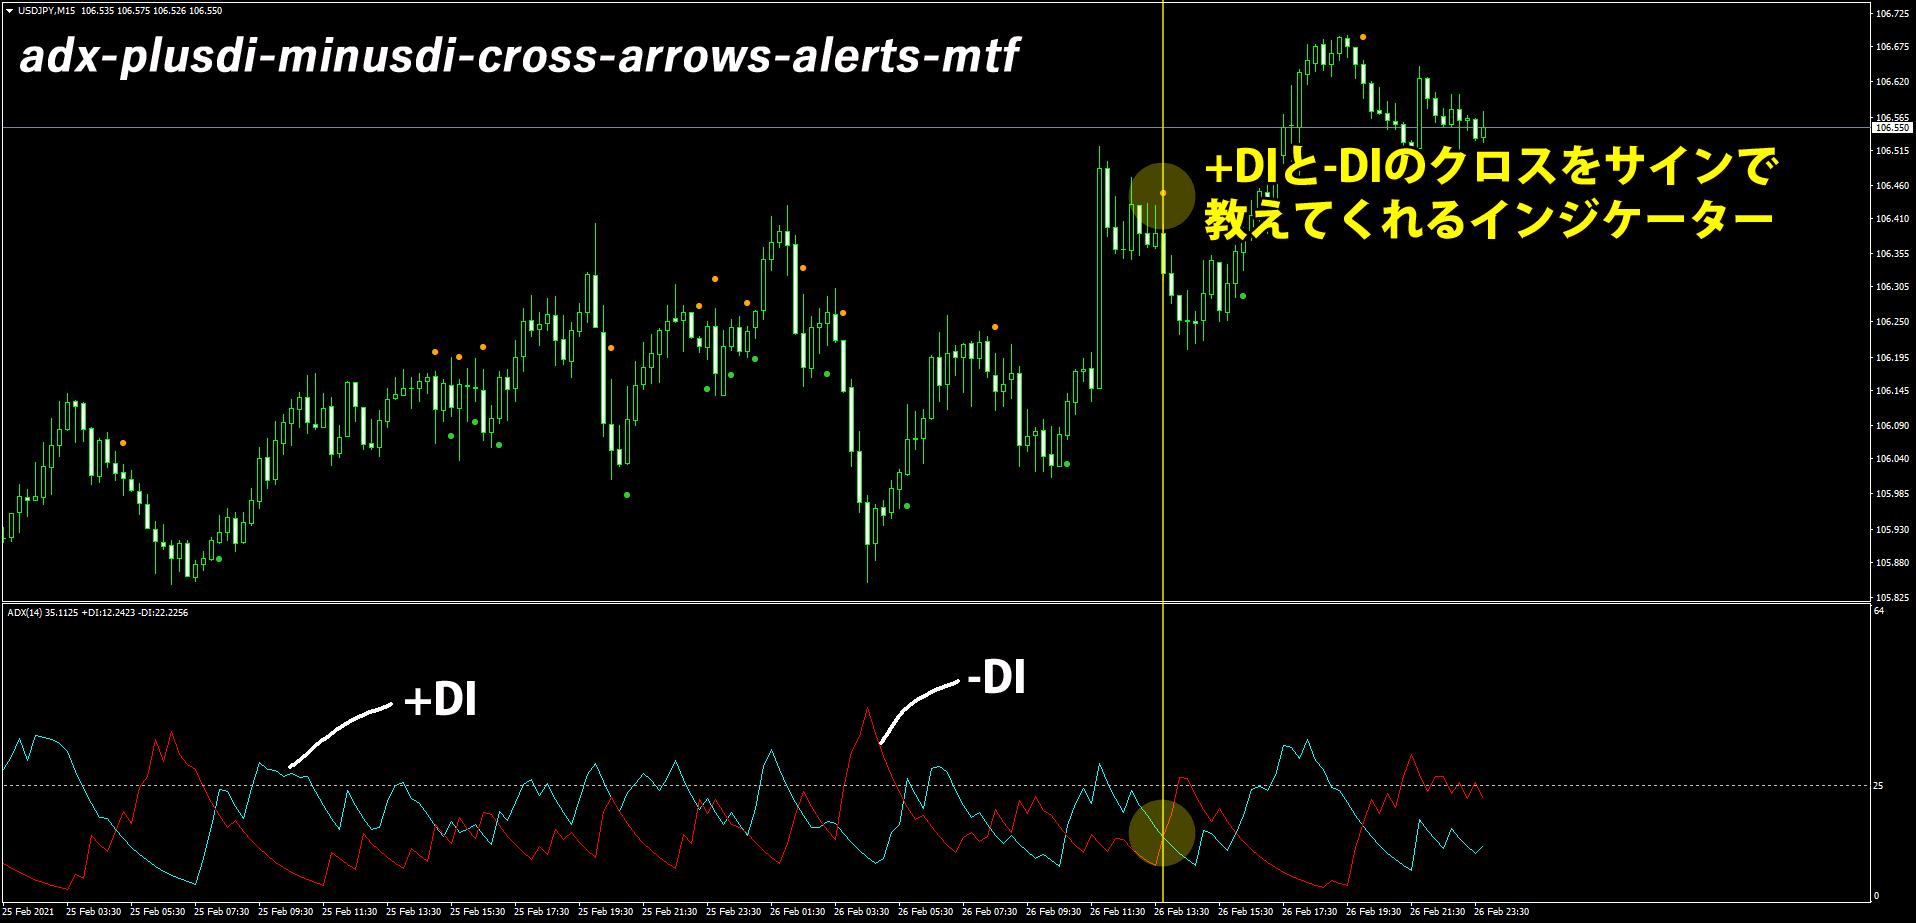 adx-plusdi-minusdi-cross-arrows-alerts-mtfを表示したチャート